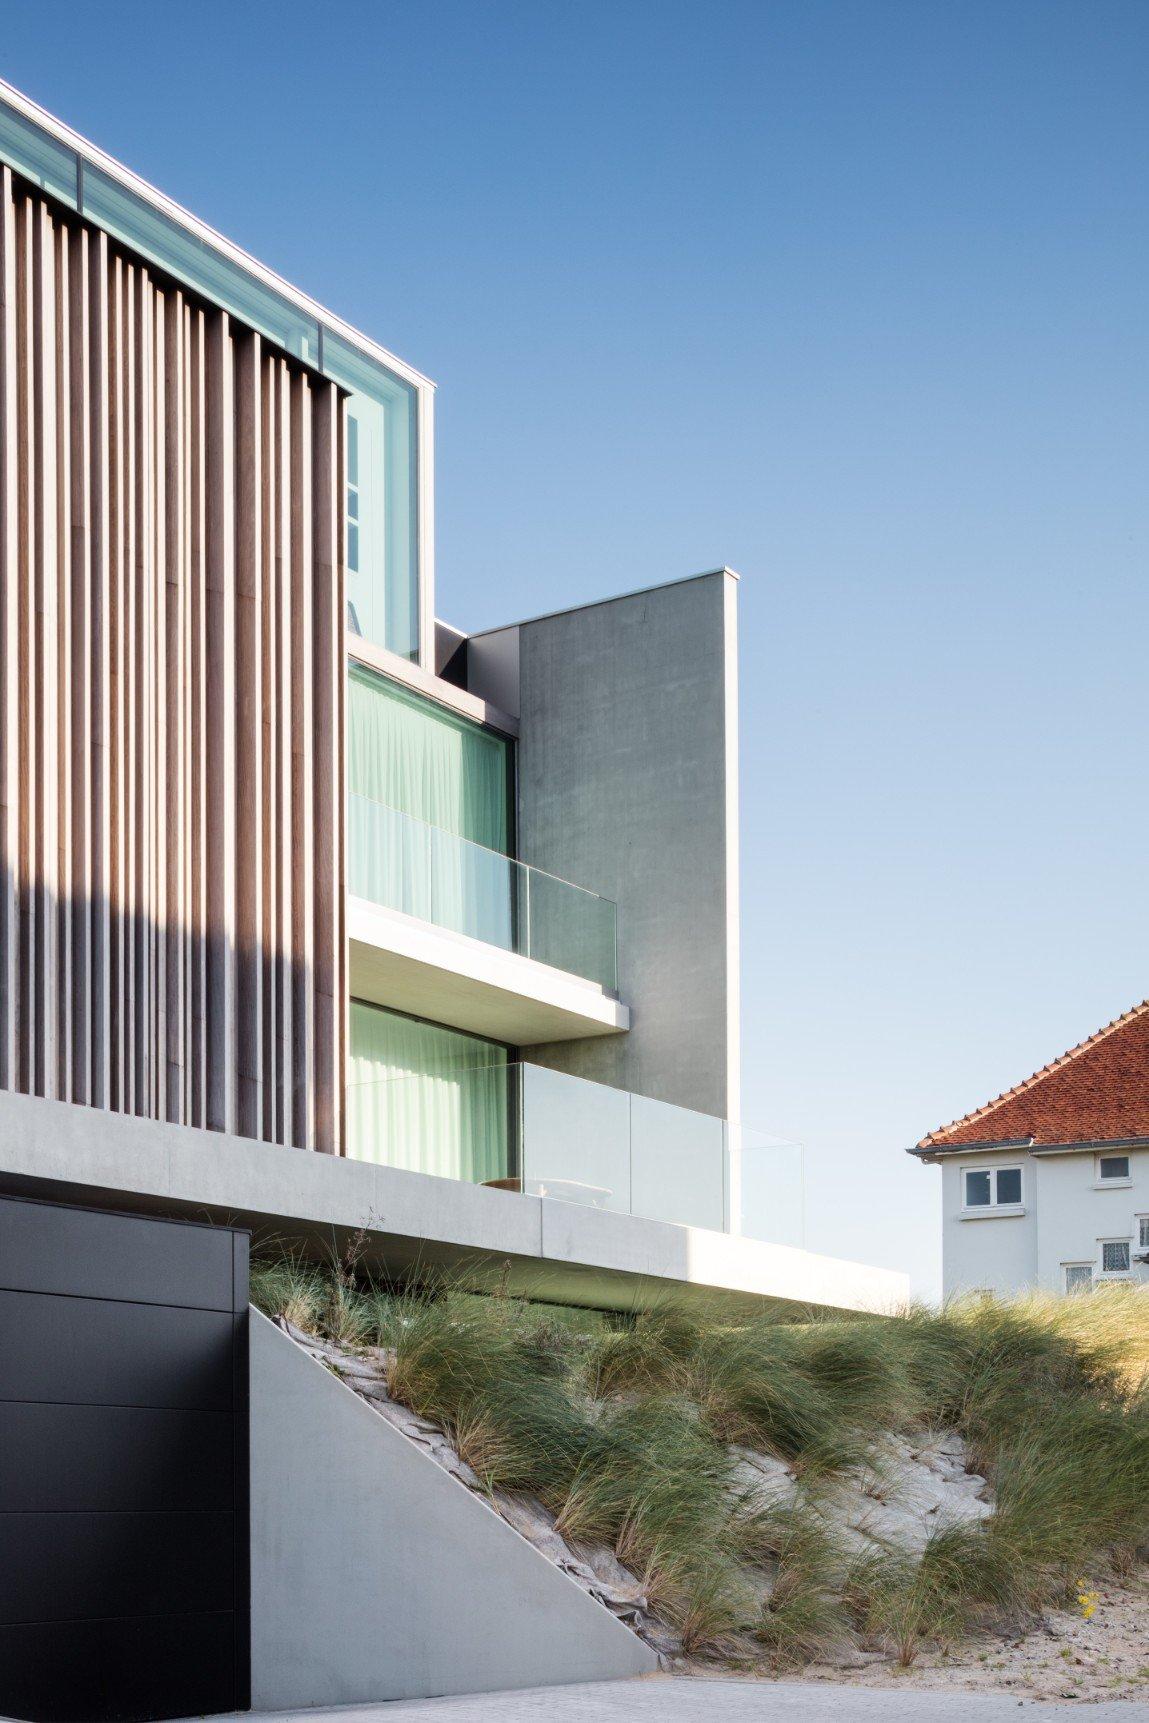 Rietveldprojects-Residence-ON-appartement-design-architectuur-kust-tvdv8.jpg